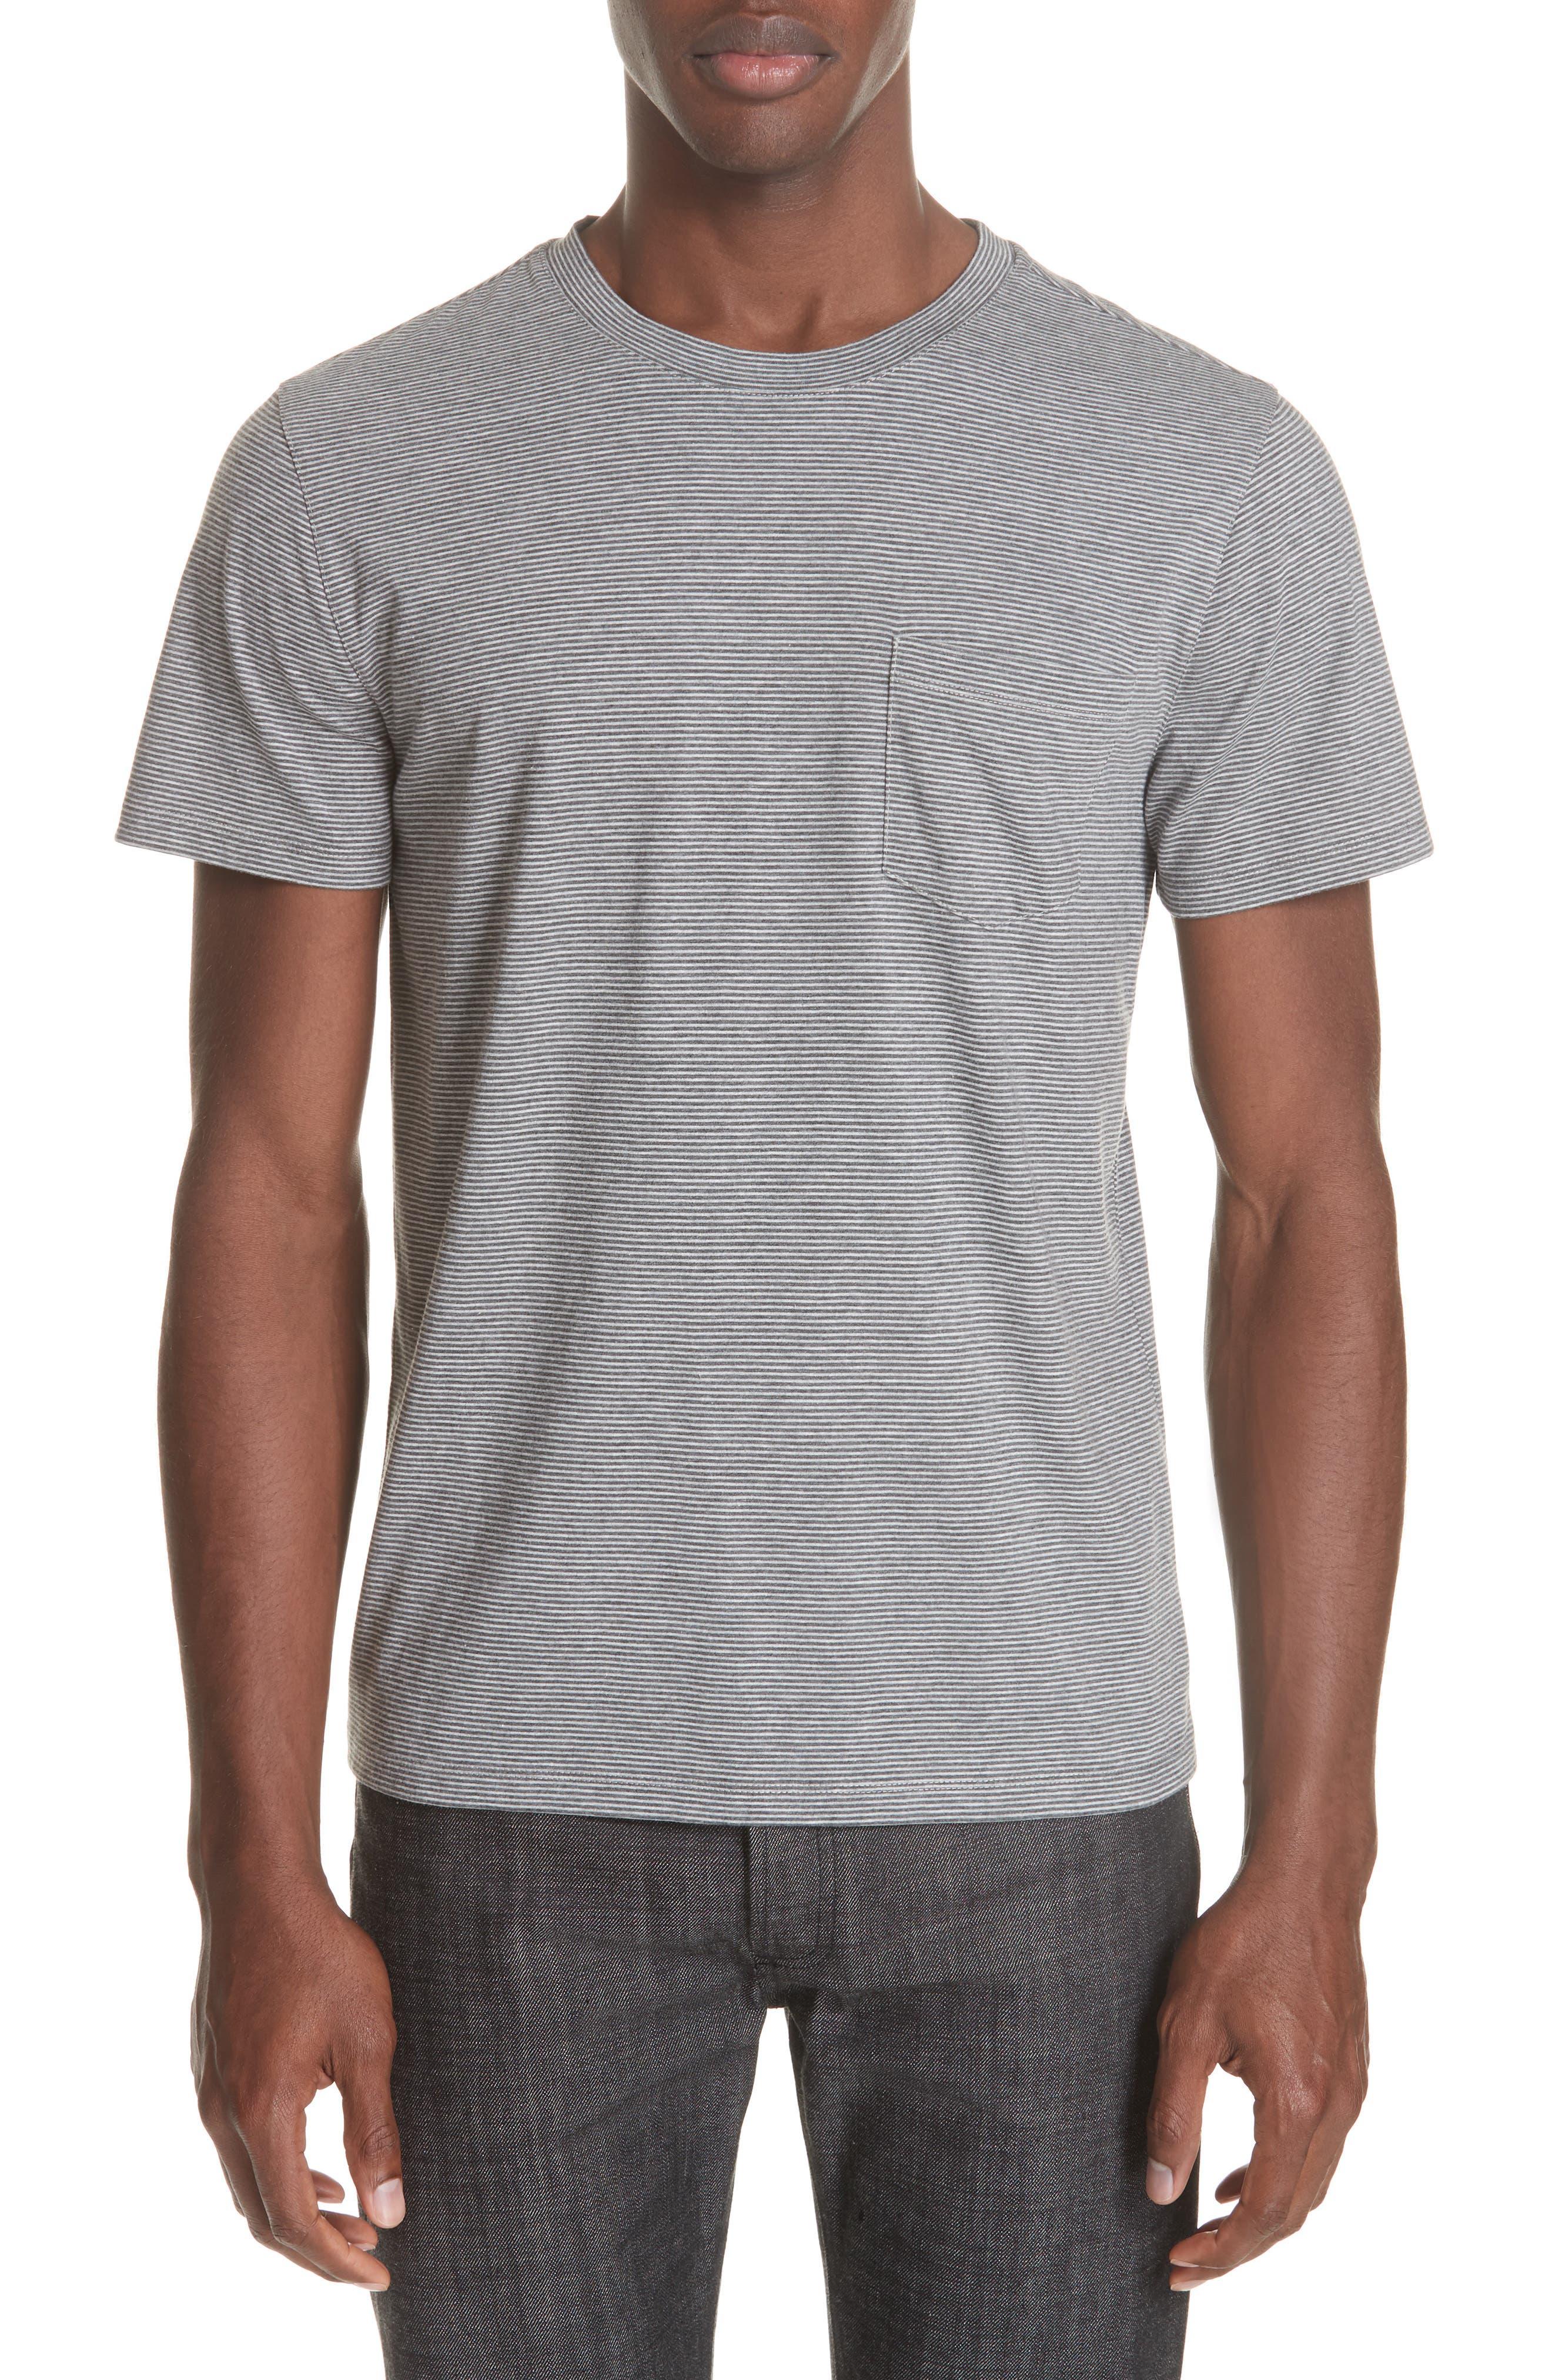 A.p.c. Keanu Striped Pocket T-Shirt, Grey